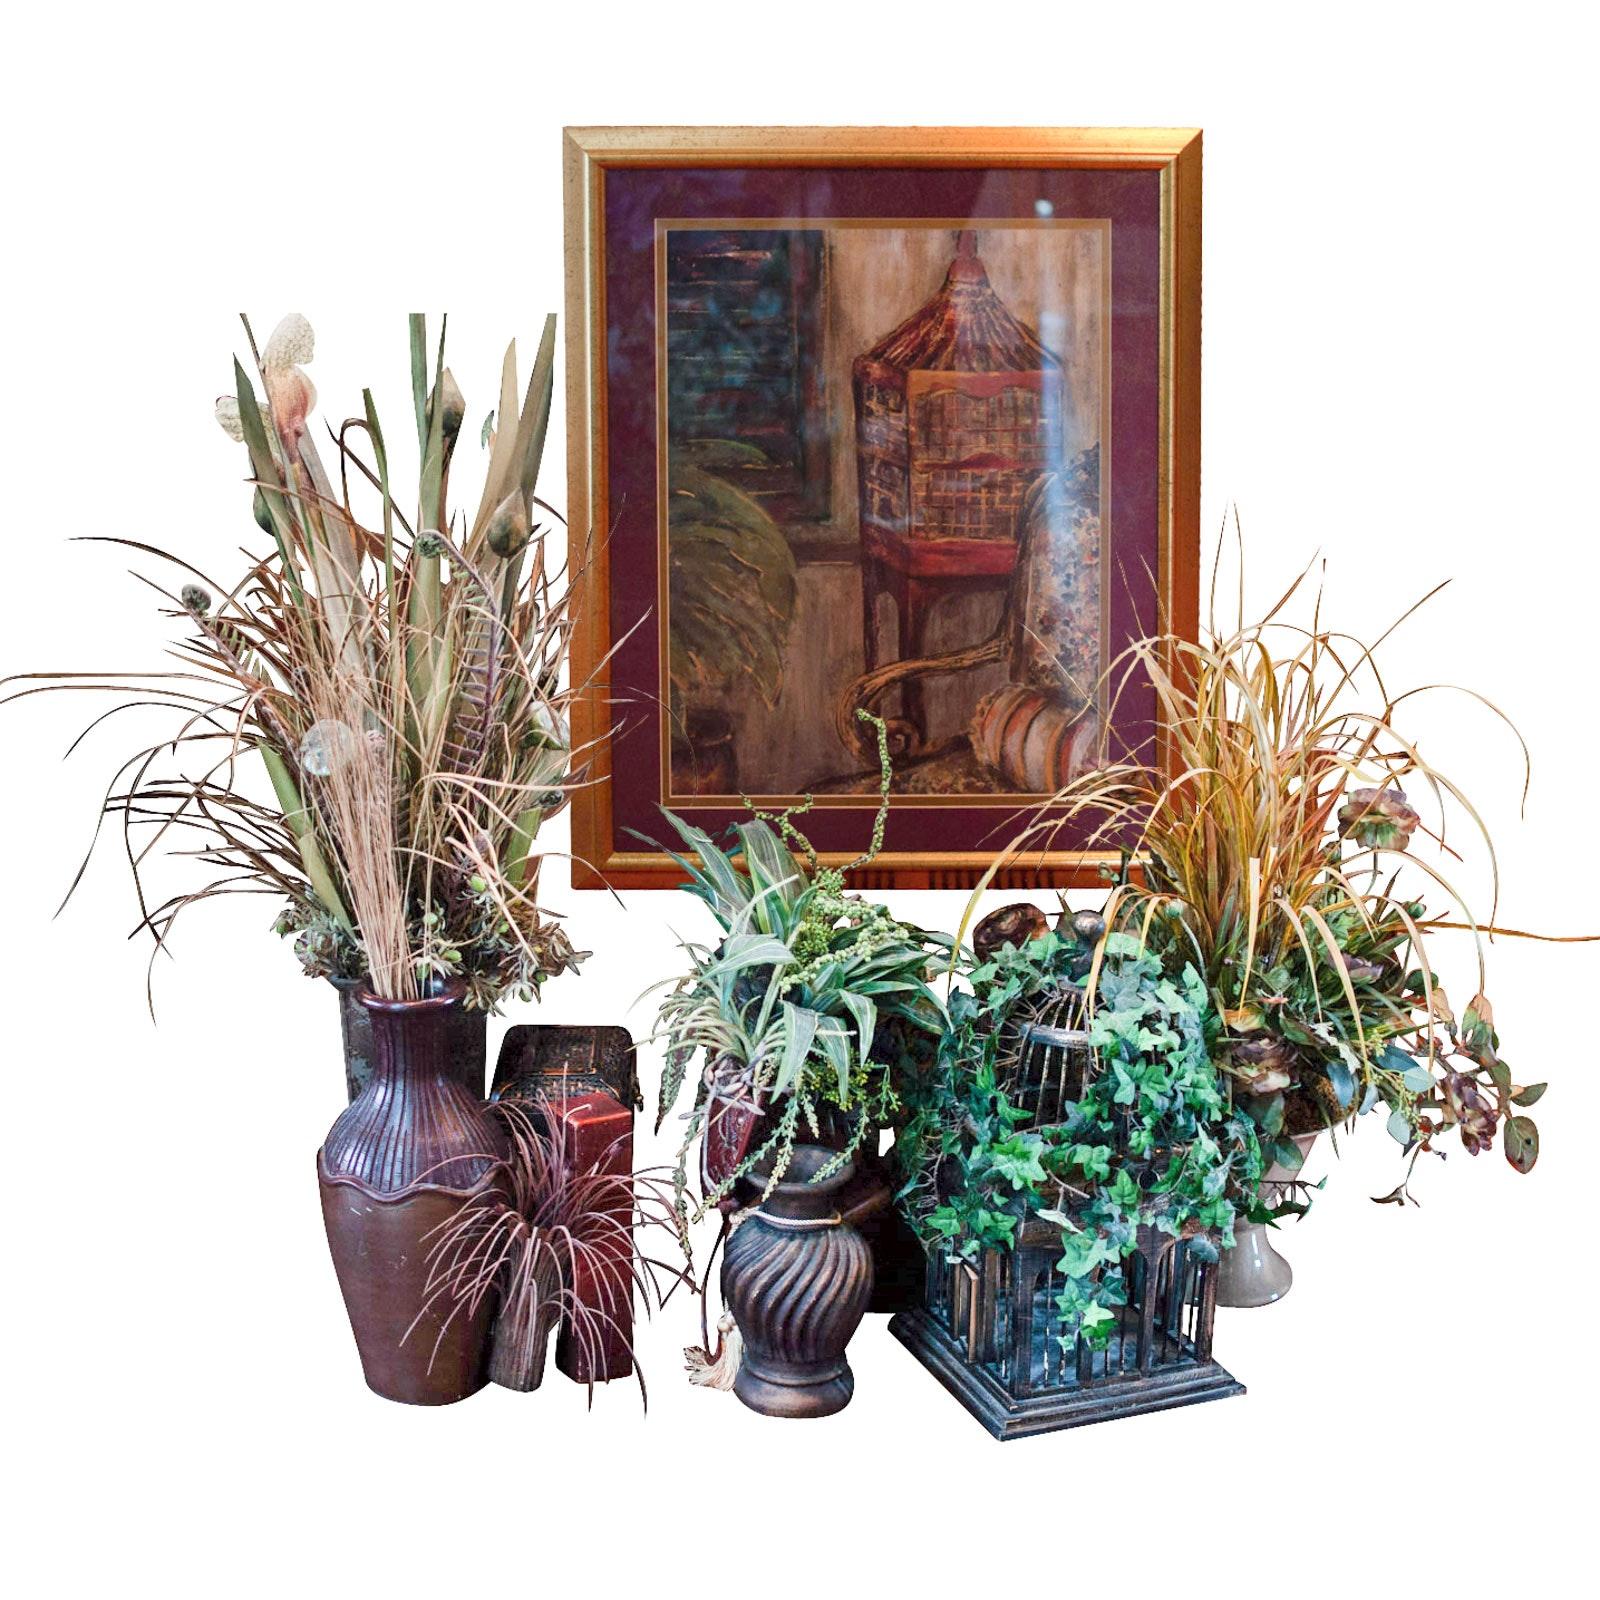 Artificial Floral Arrangements with Framed Print Including Pier 1